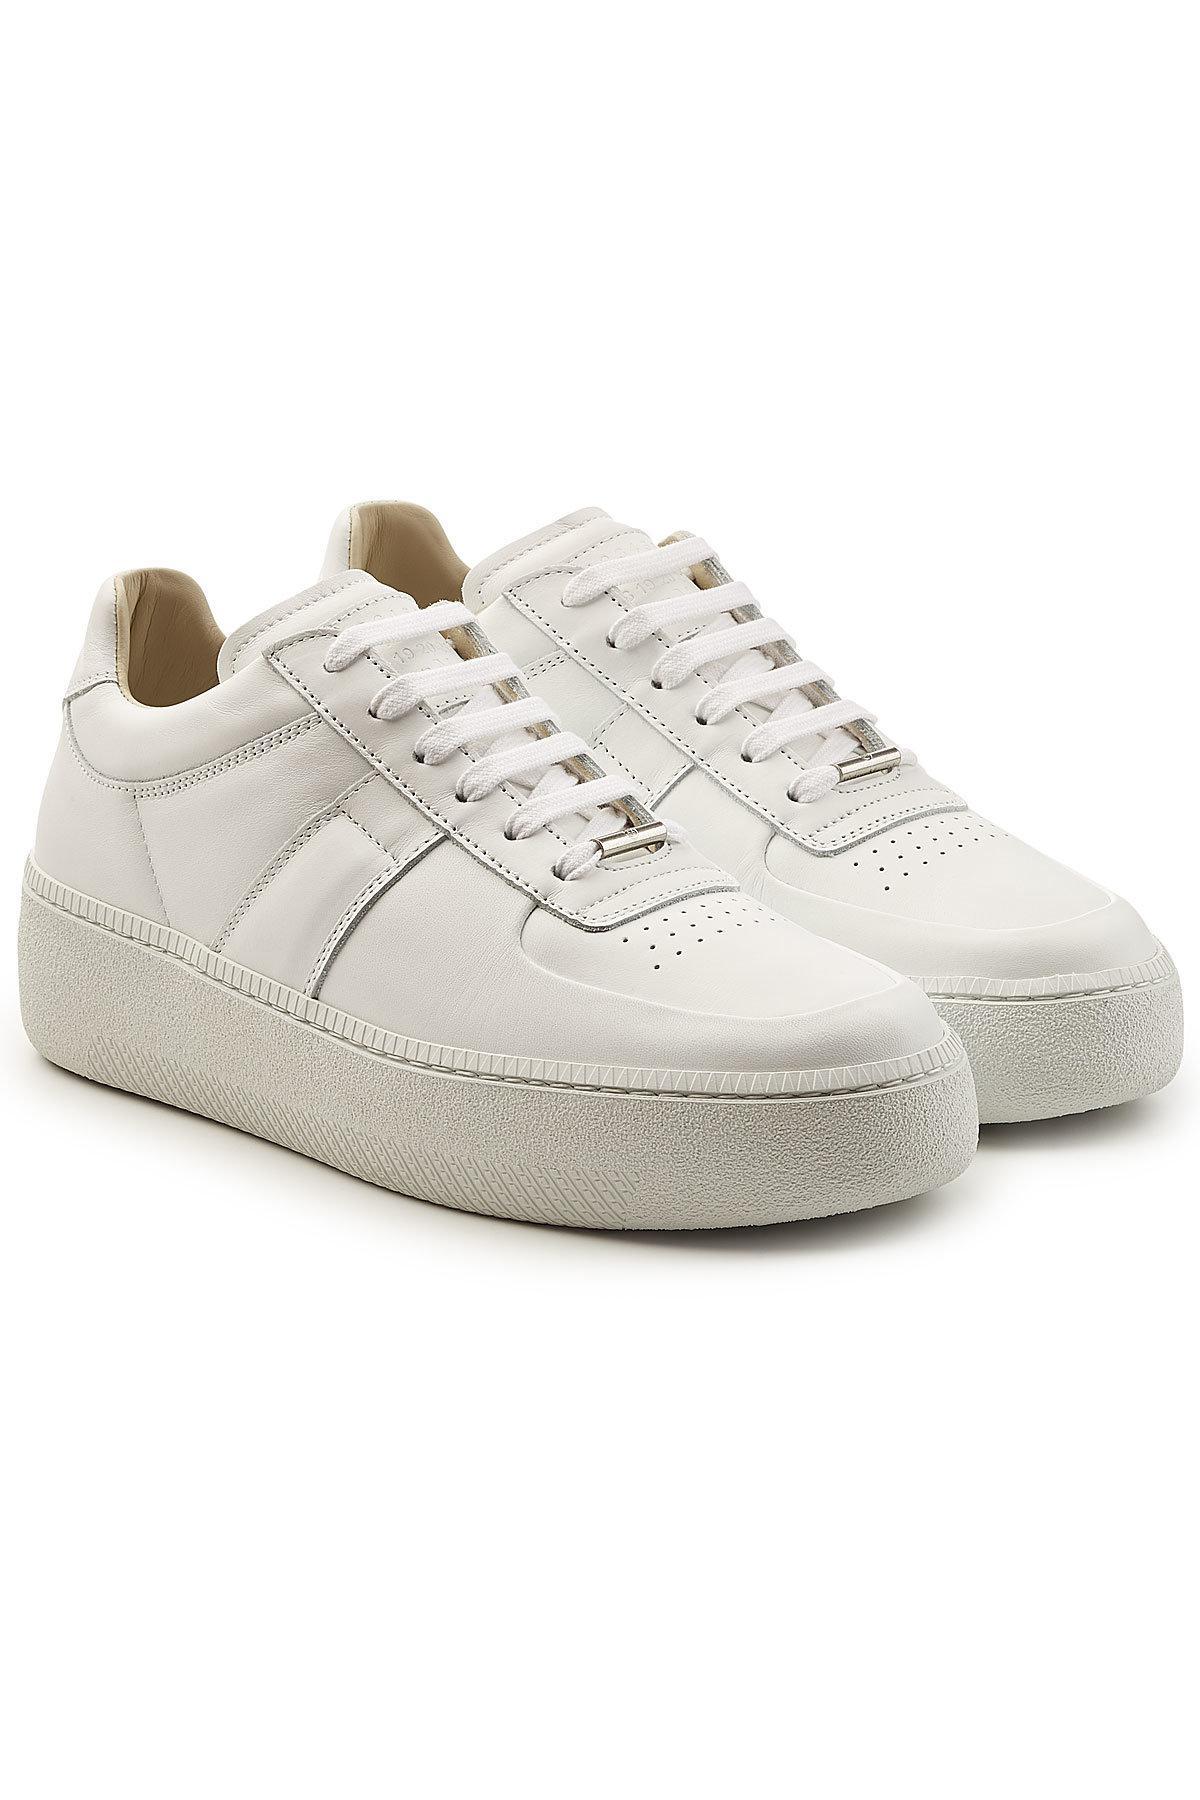 Mens Platform-Sole Leather Sneakers Maison Martin Margiela Sj5UCU9q